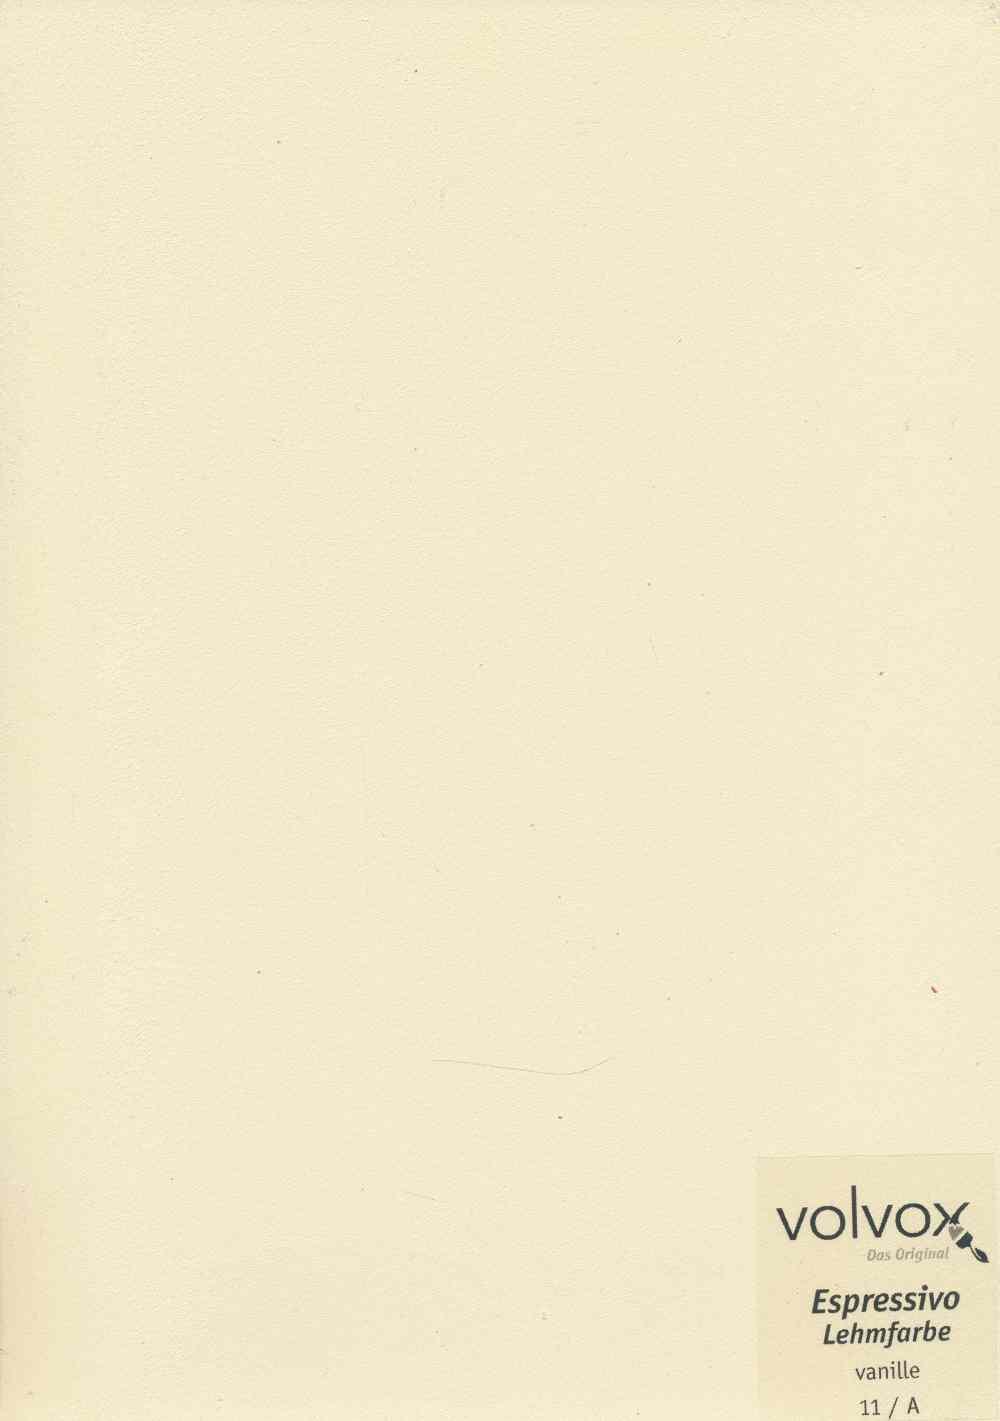 Volvox Espressivo Lehmfarbe 011 vanille